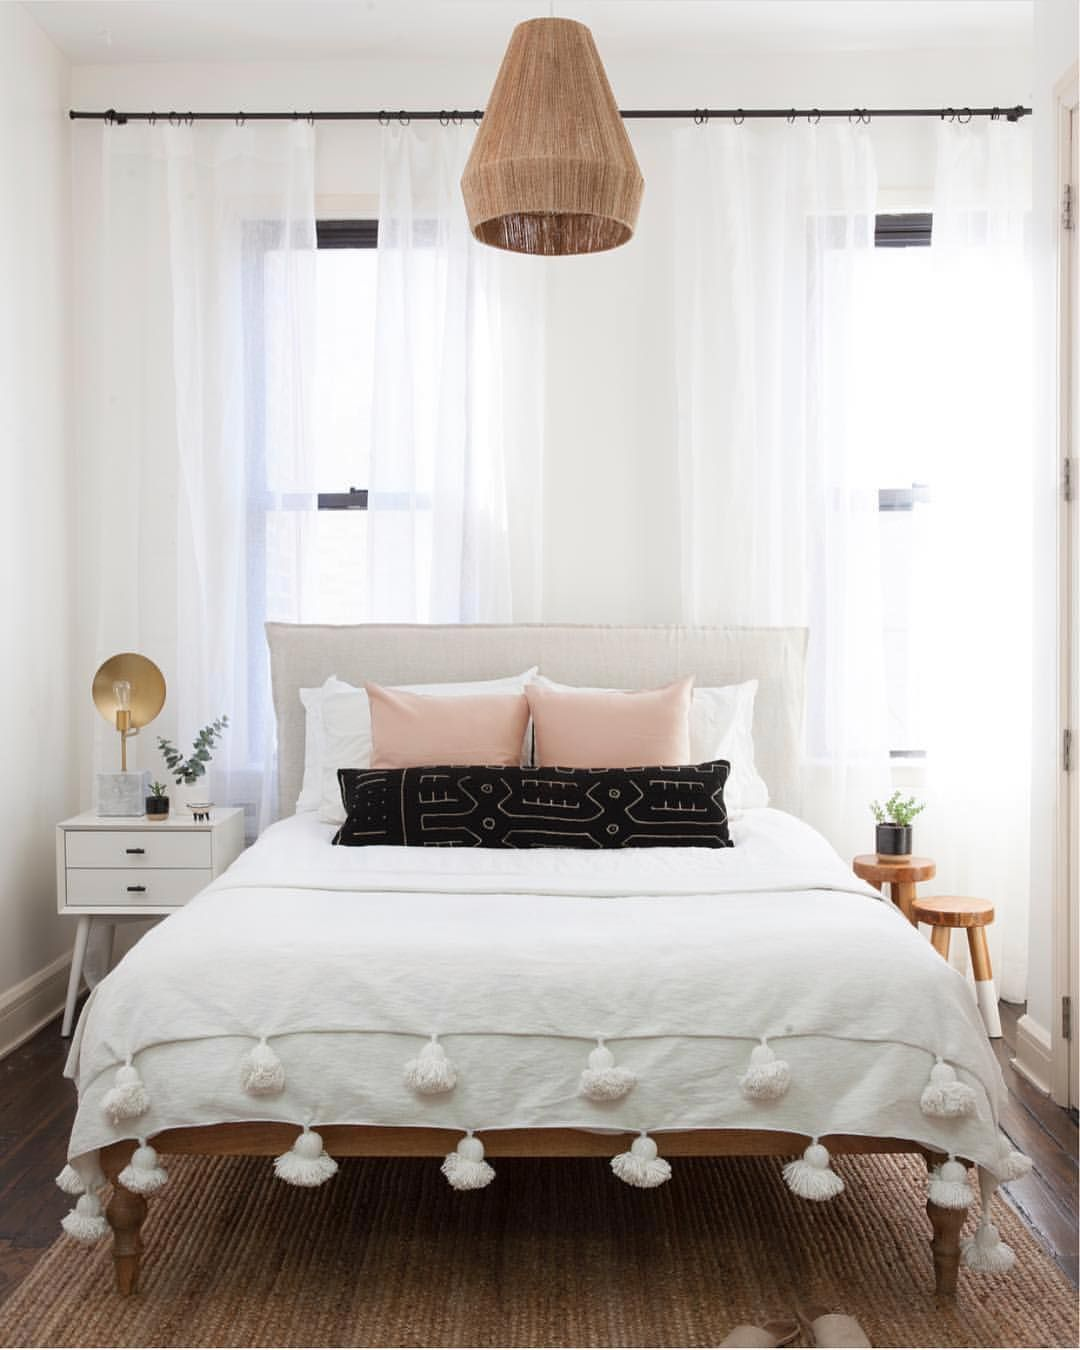 Pin by sara gonzalez on m y h a p p y place in bedroom home